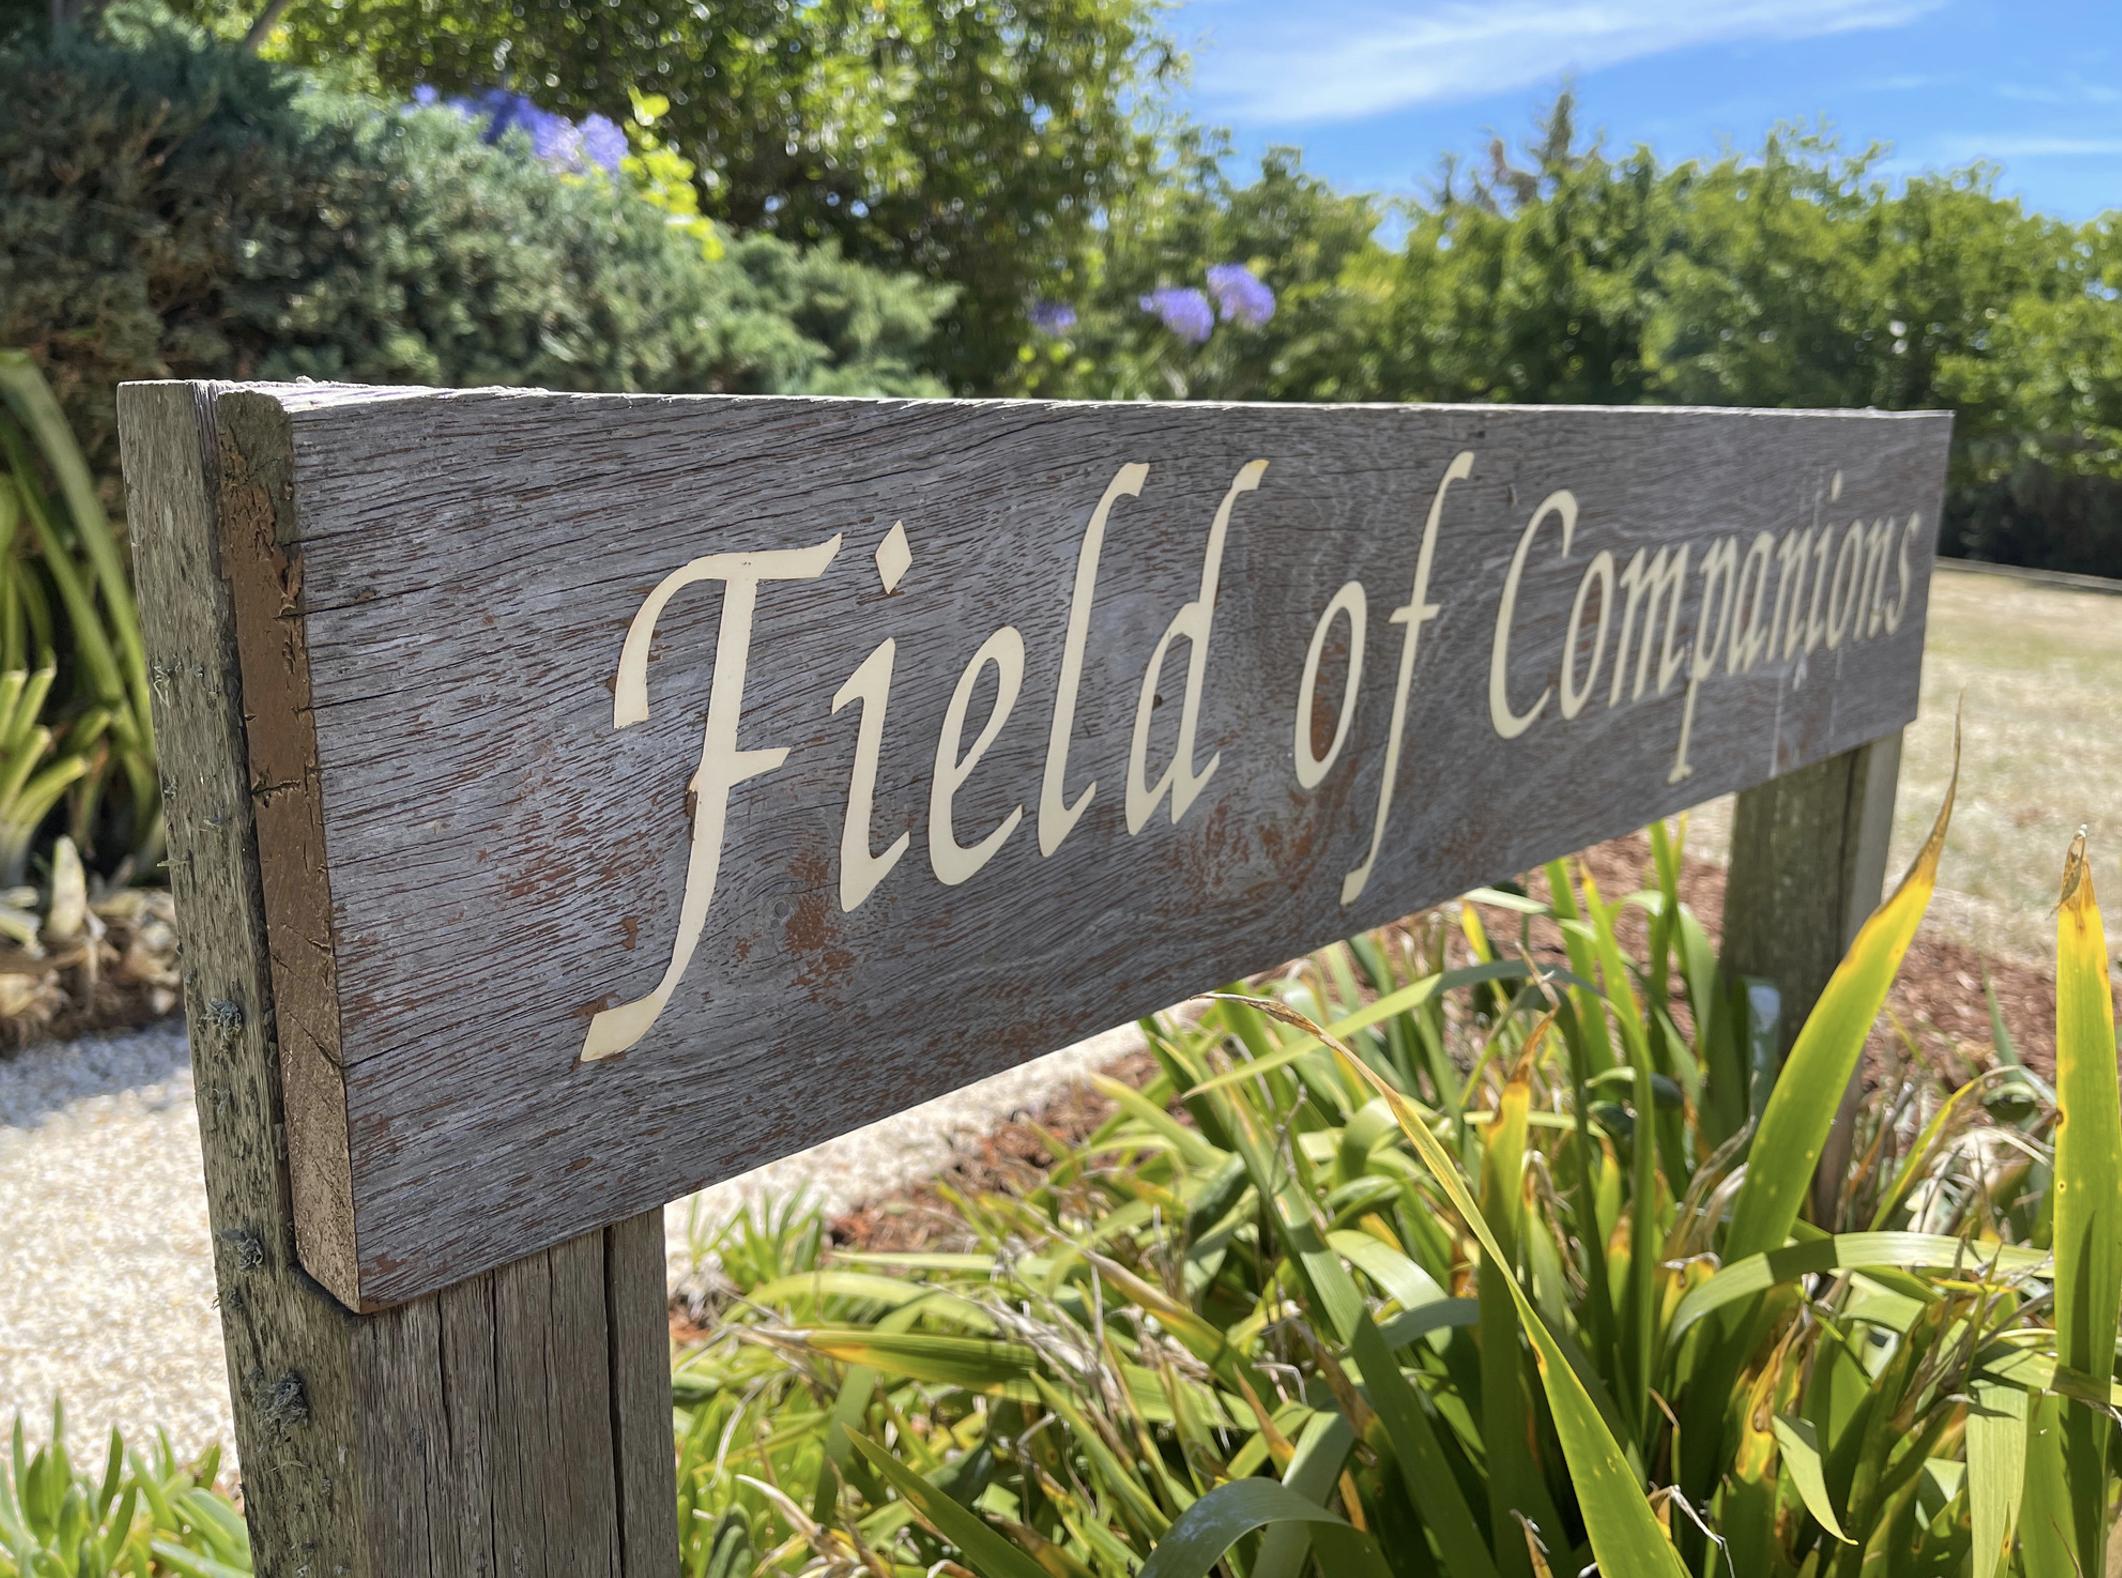 Field of Companions